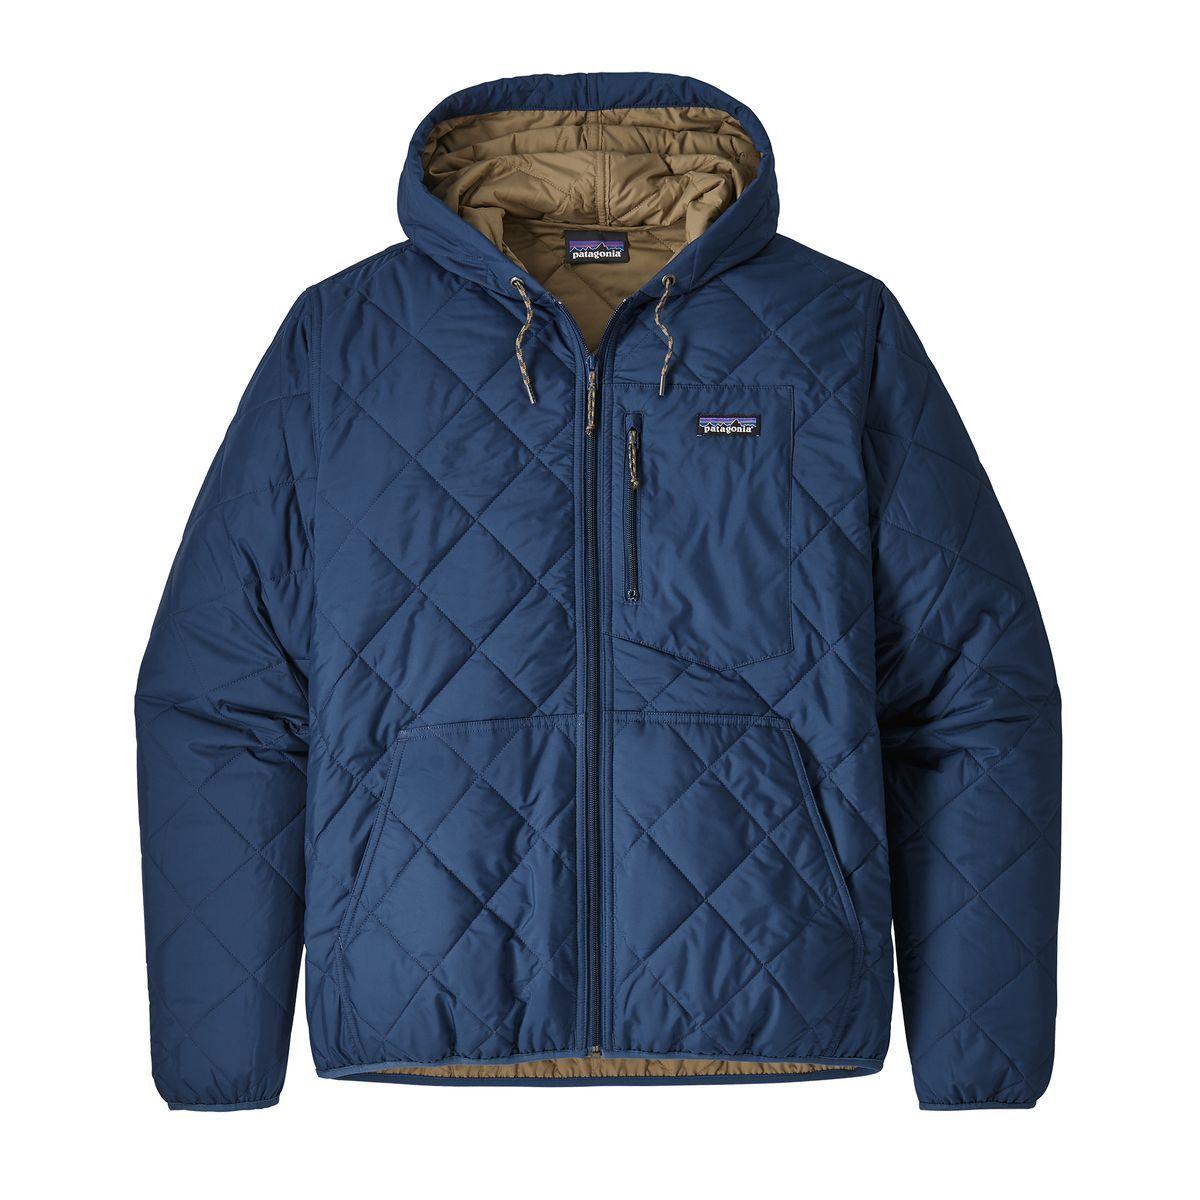 Patagonia Men S Diamond Quilted Bomber Hoody In 2021 Quilted Bomber Hooded Jacket Men Patagonia Mens [ 1200 x 1200 Pixel ]